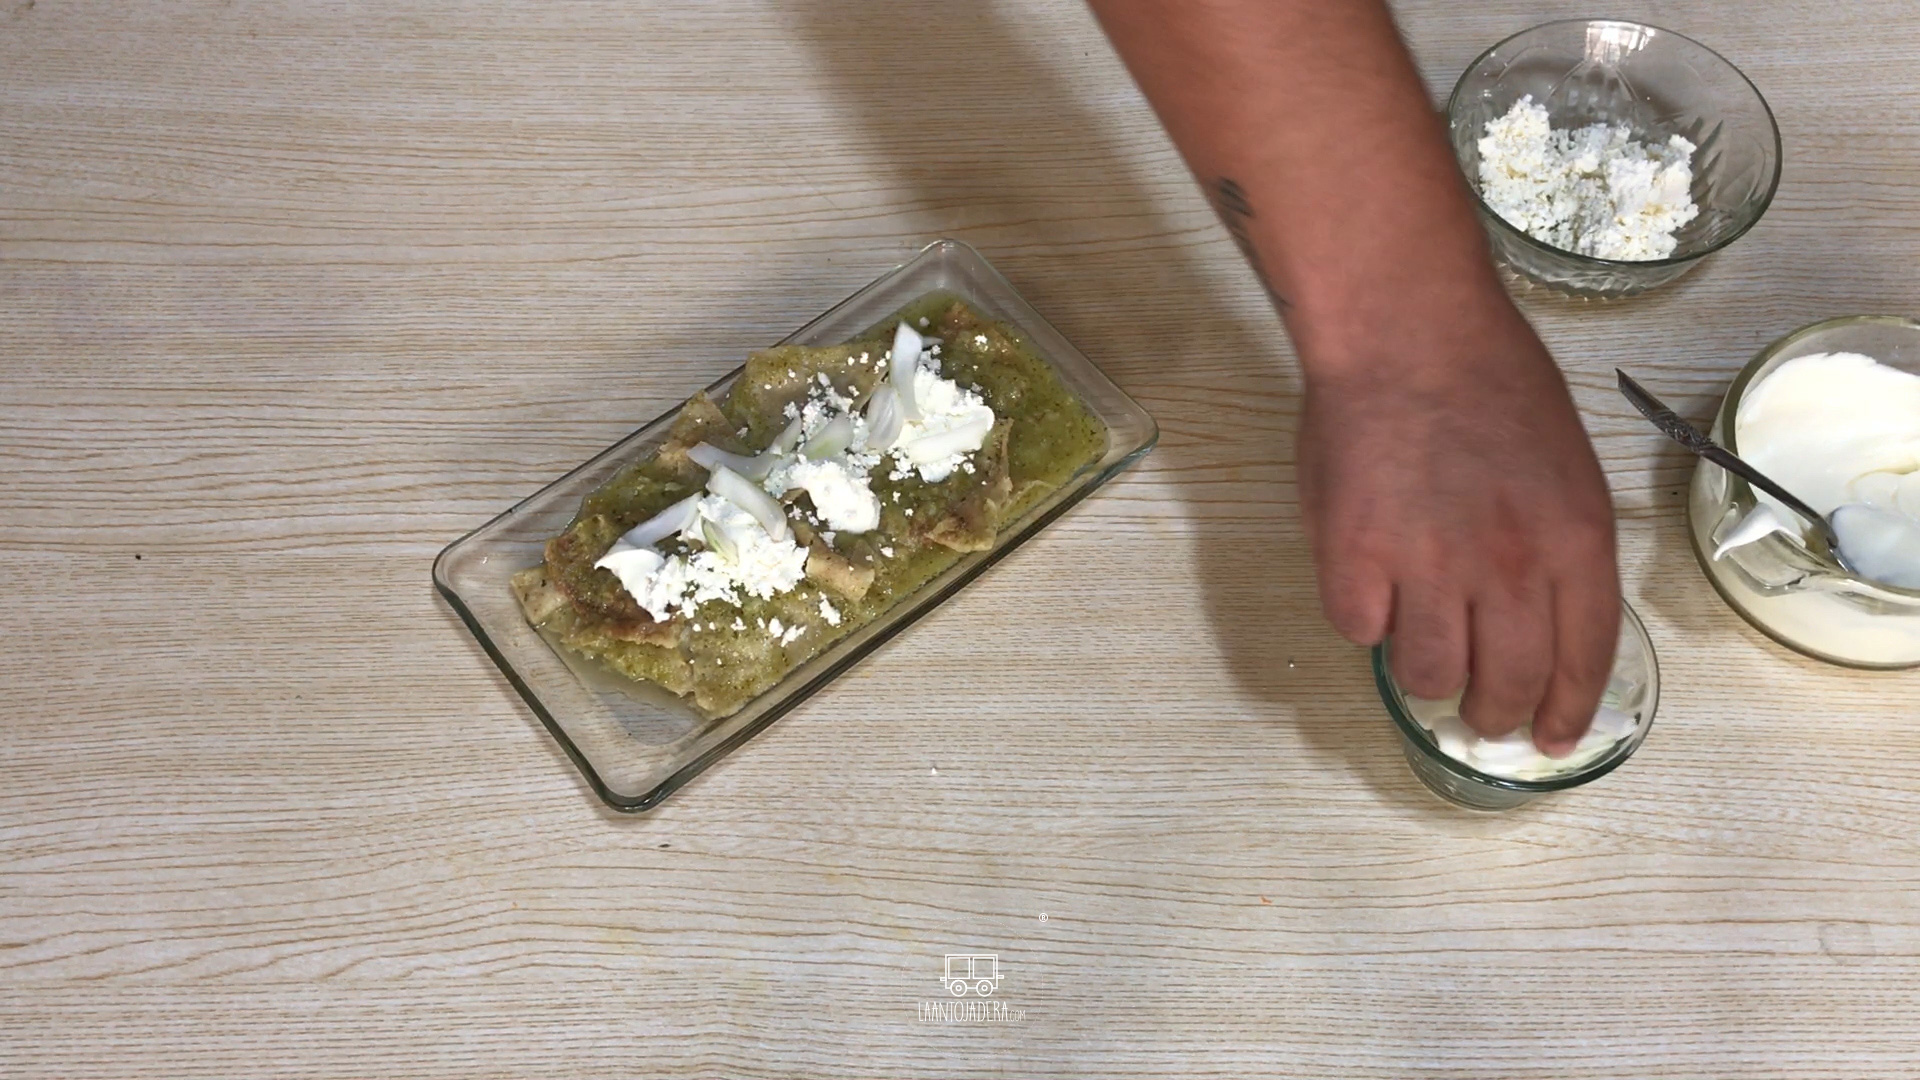 La Antojadera | Chilaquiles Verdes